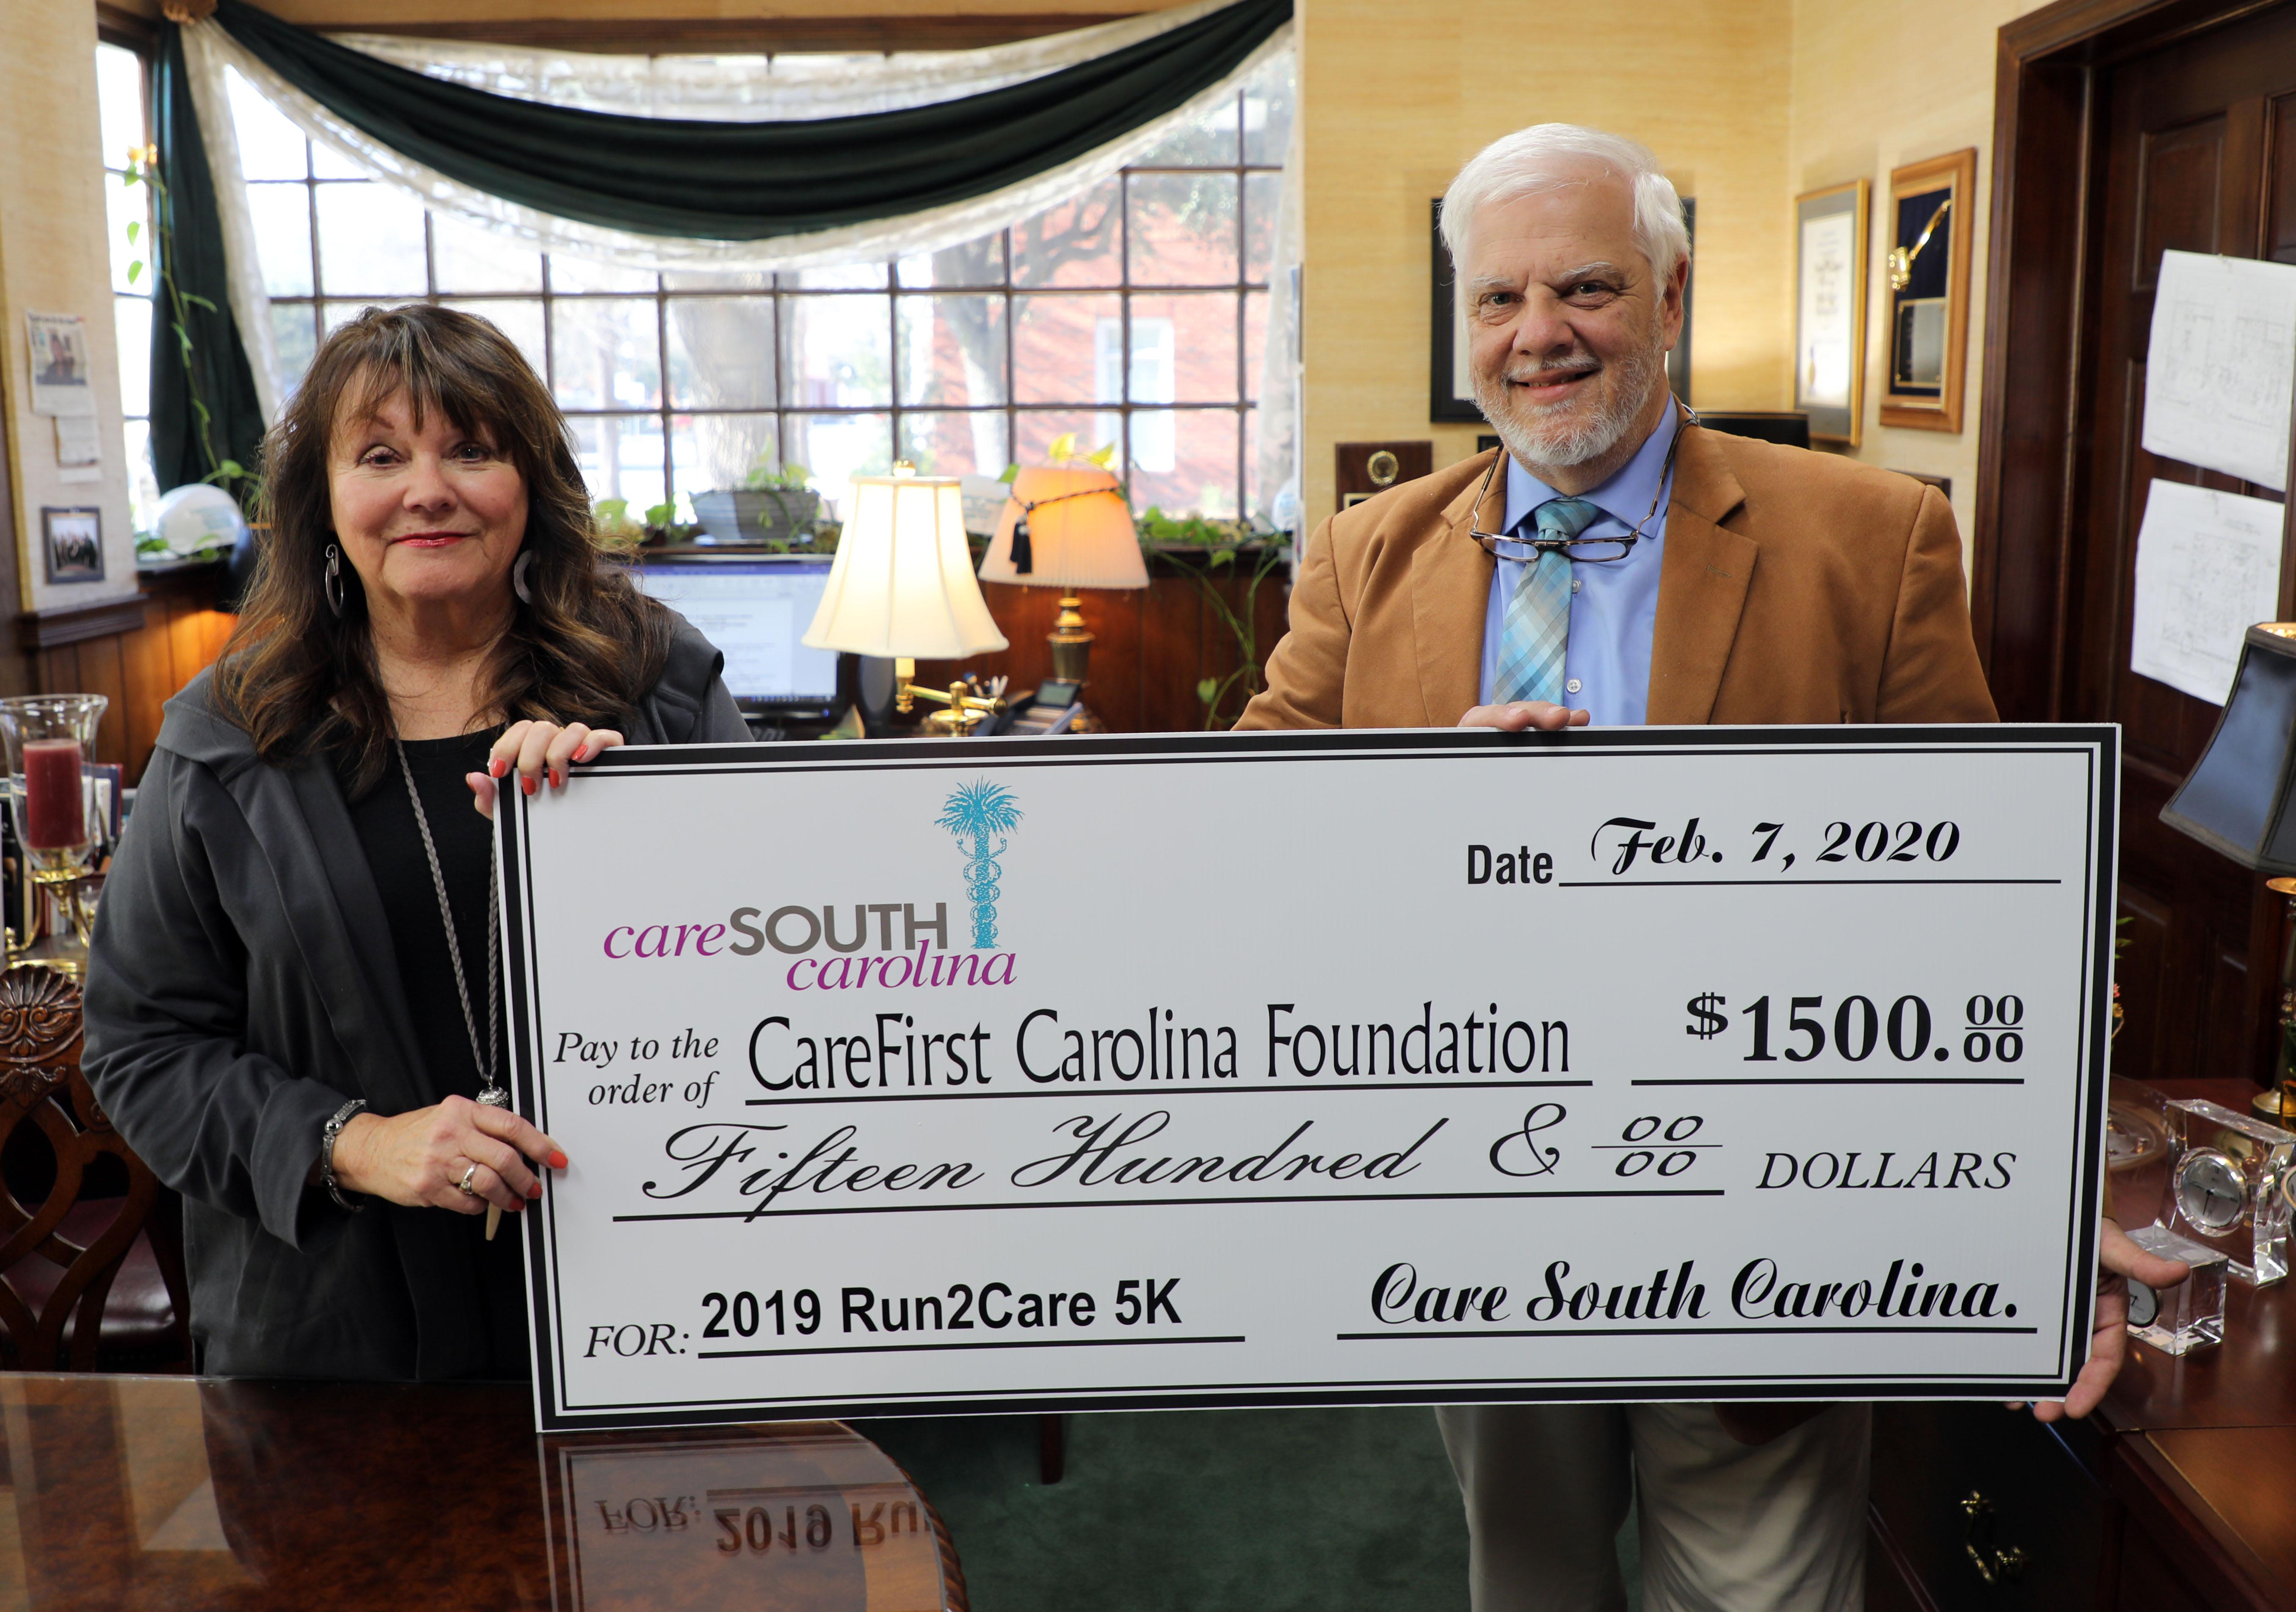 CareSouth Carolina presents $1,500 to CareFIRST Carolina Foundation